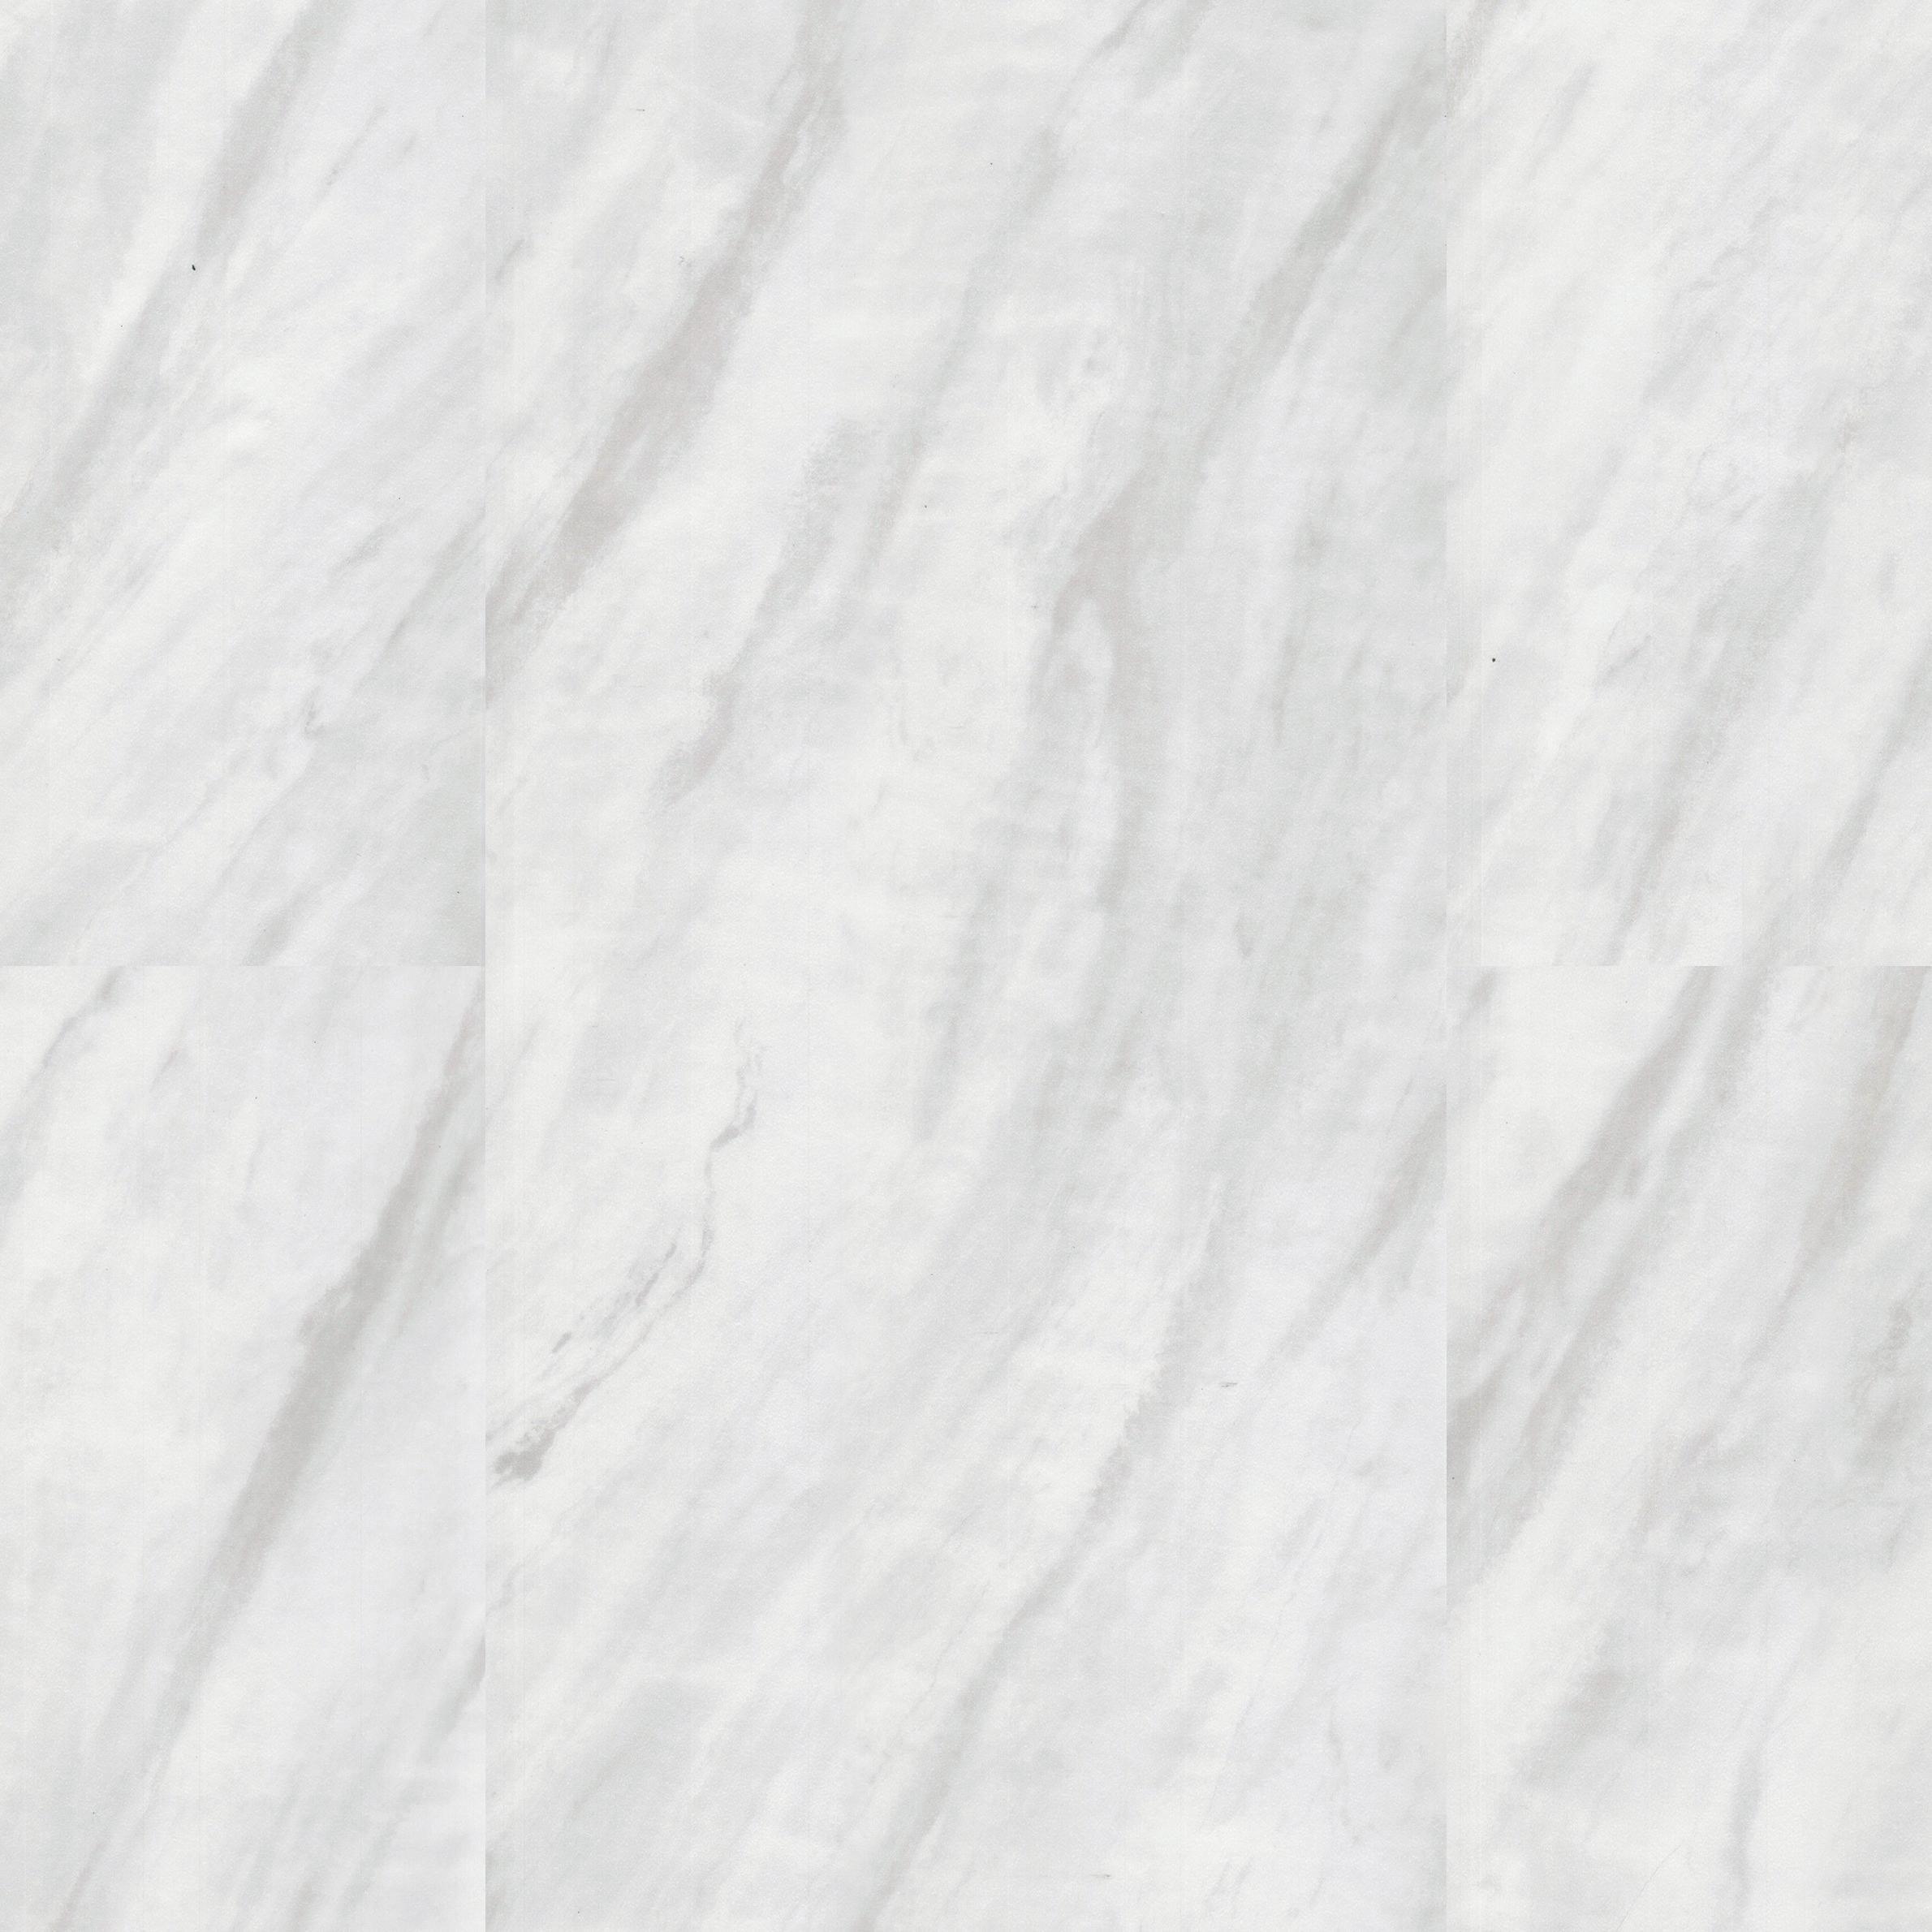 Moduleo Vision Light Grey Marble Waterproof Vinyl Flooring